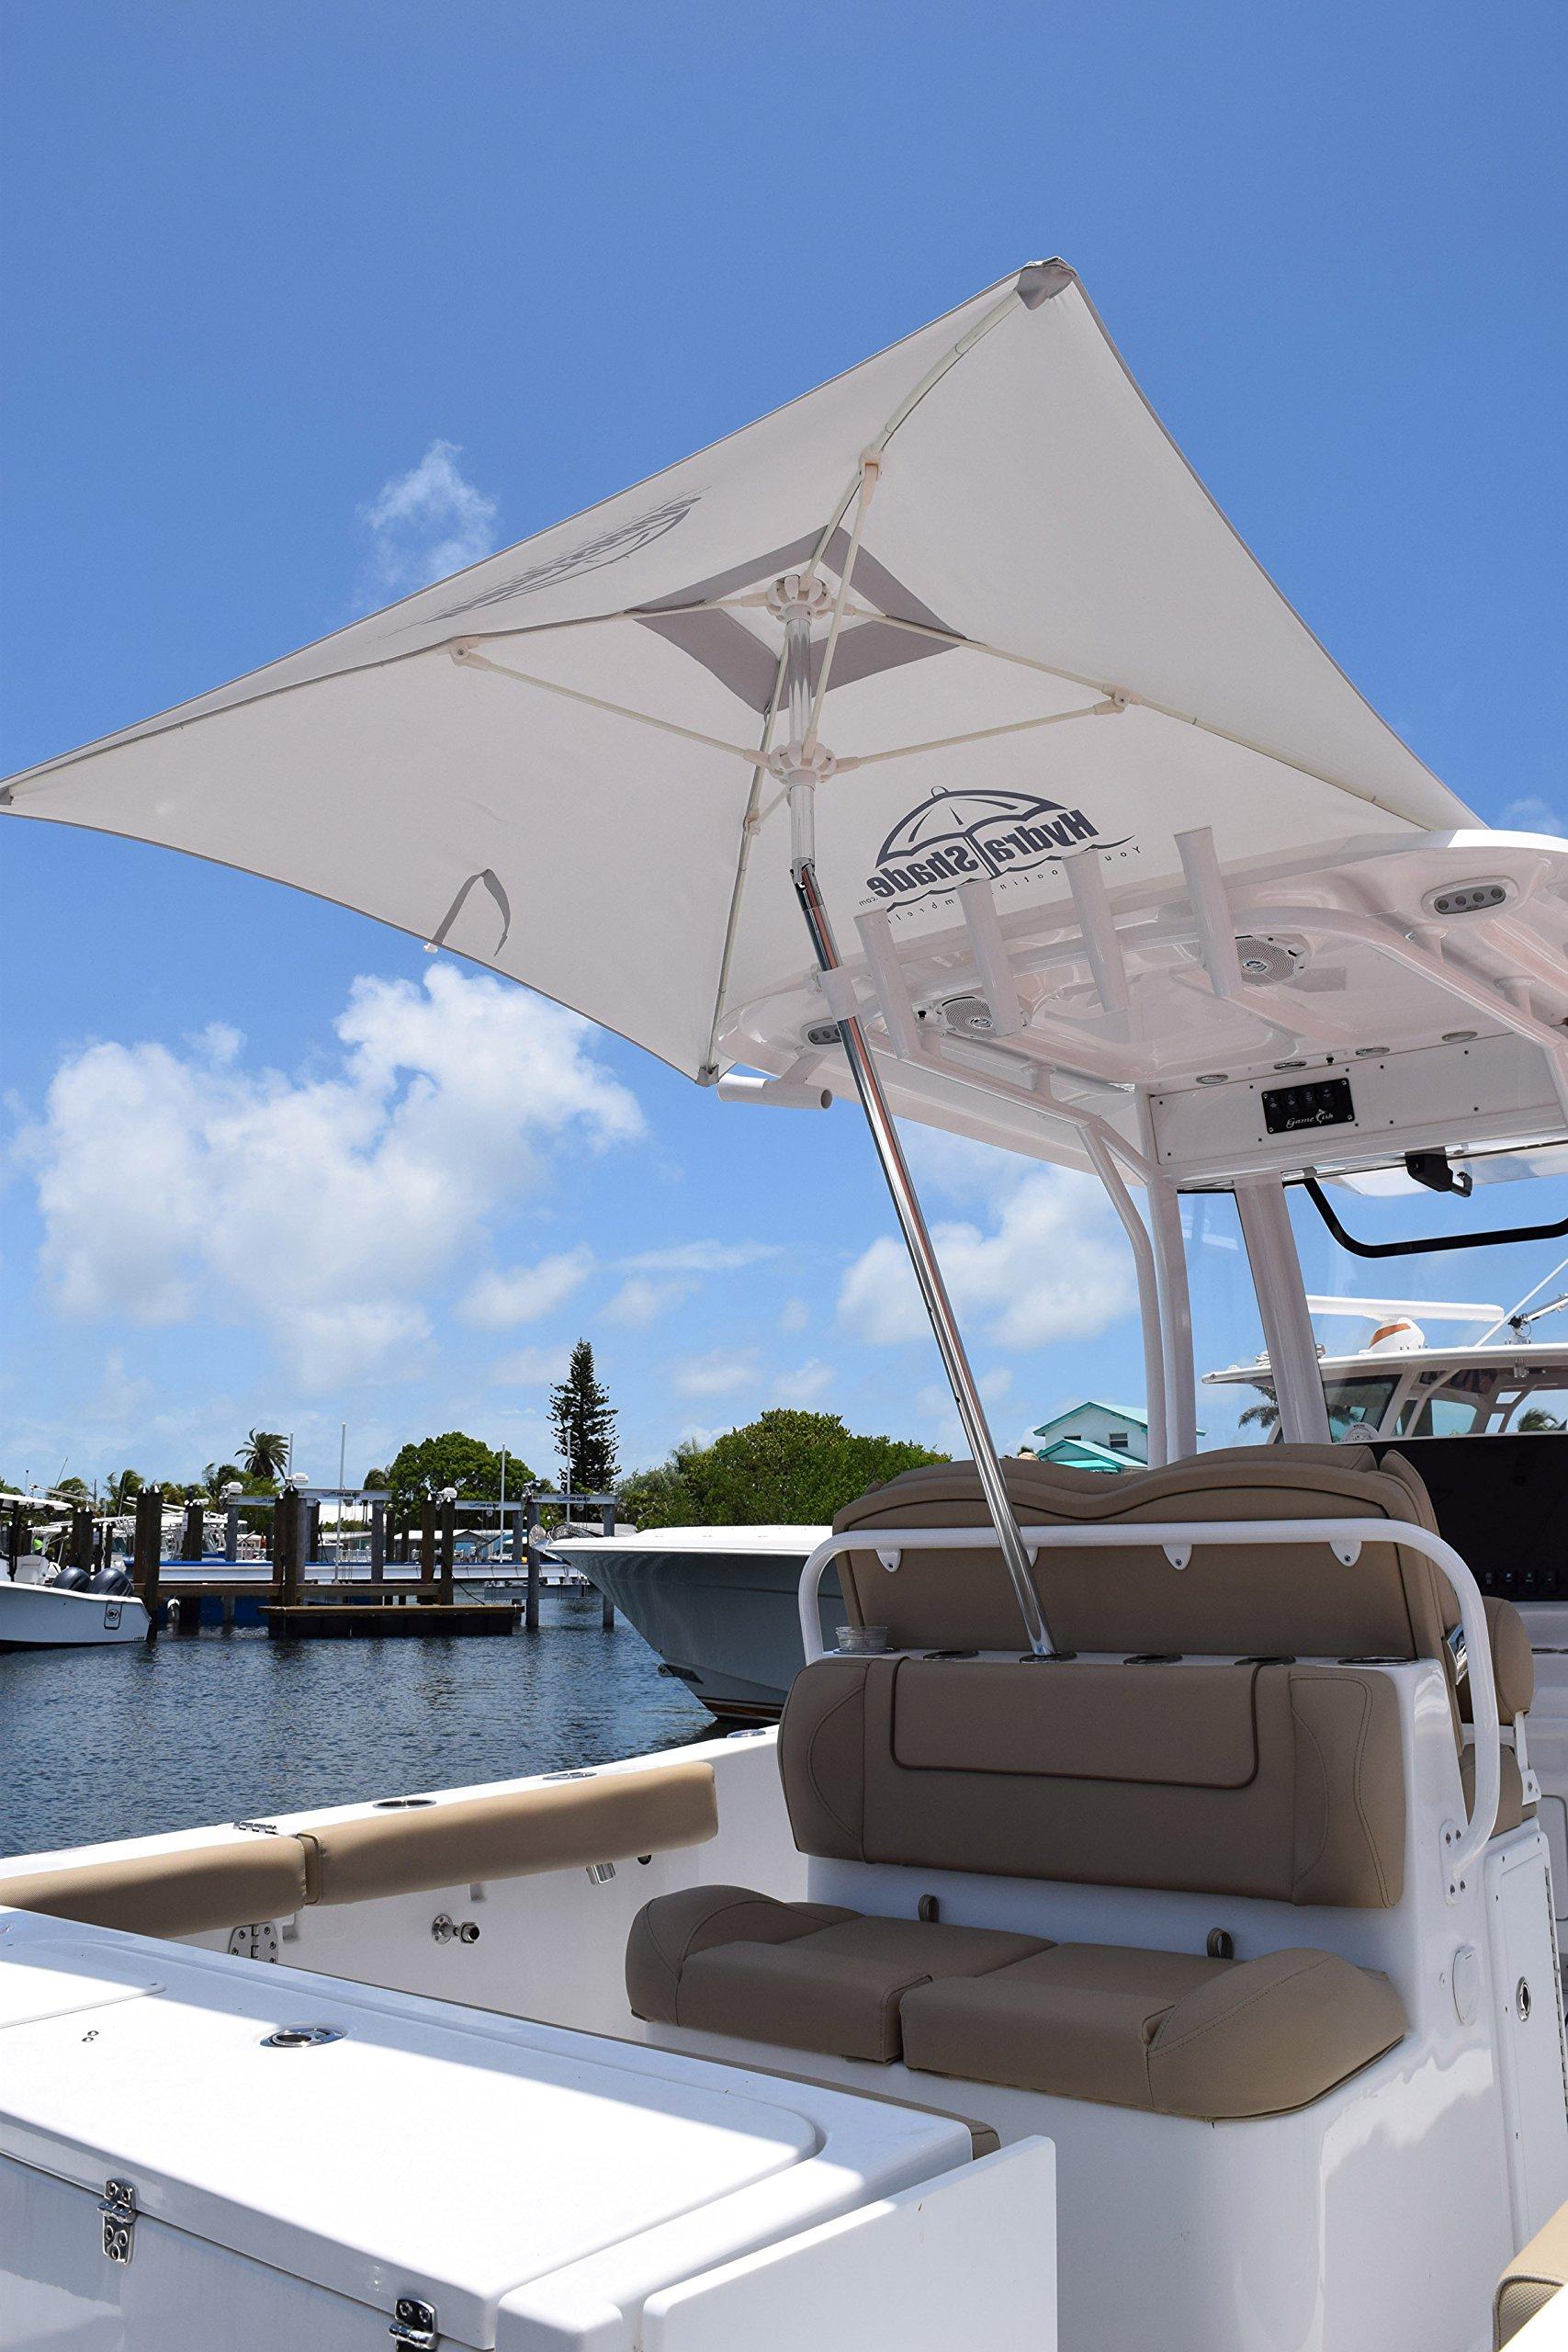 Hospitality Rattan XL-150 Hydra Shade 8' Square Boating & Beach Umbrella Kit, White by Hospitality Rattan (Image #2)